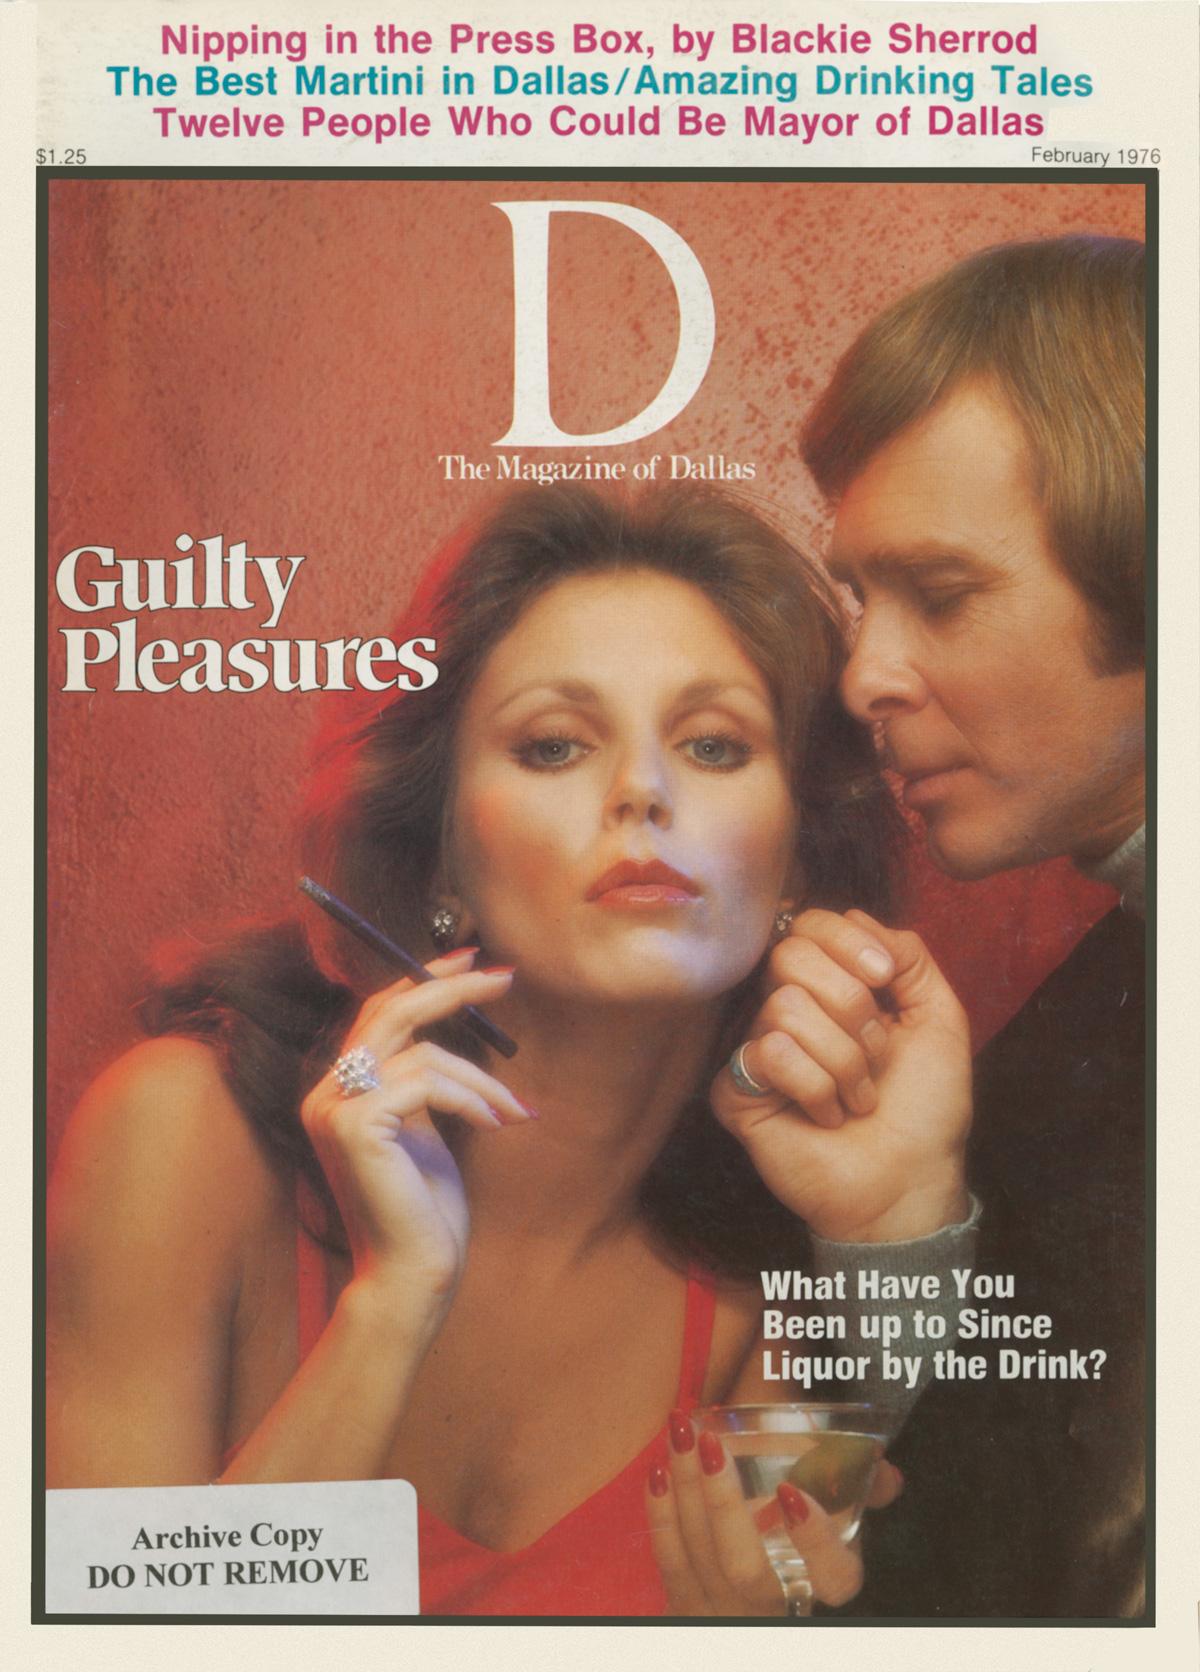 February 1976 cover